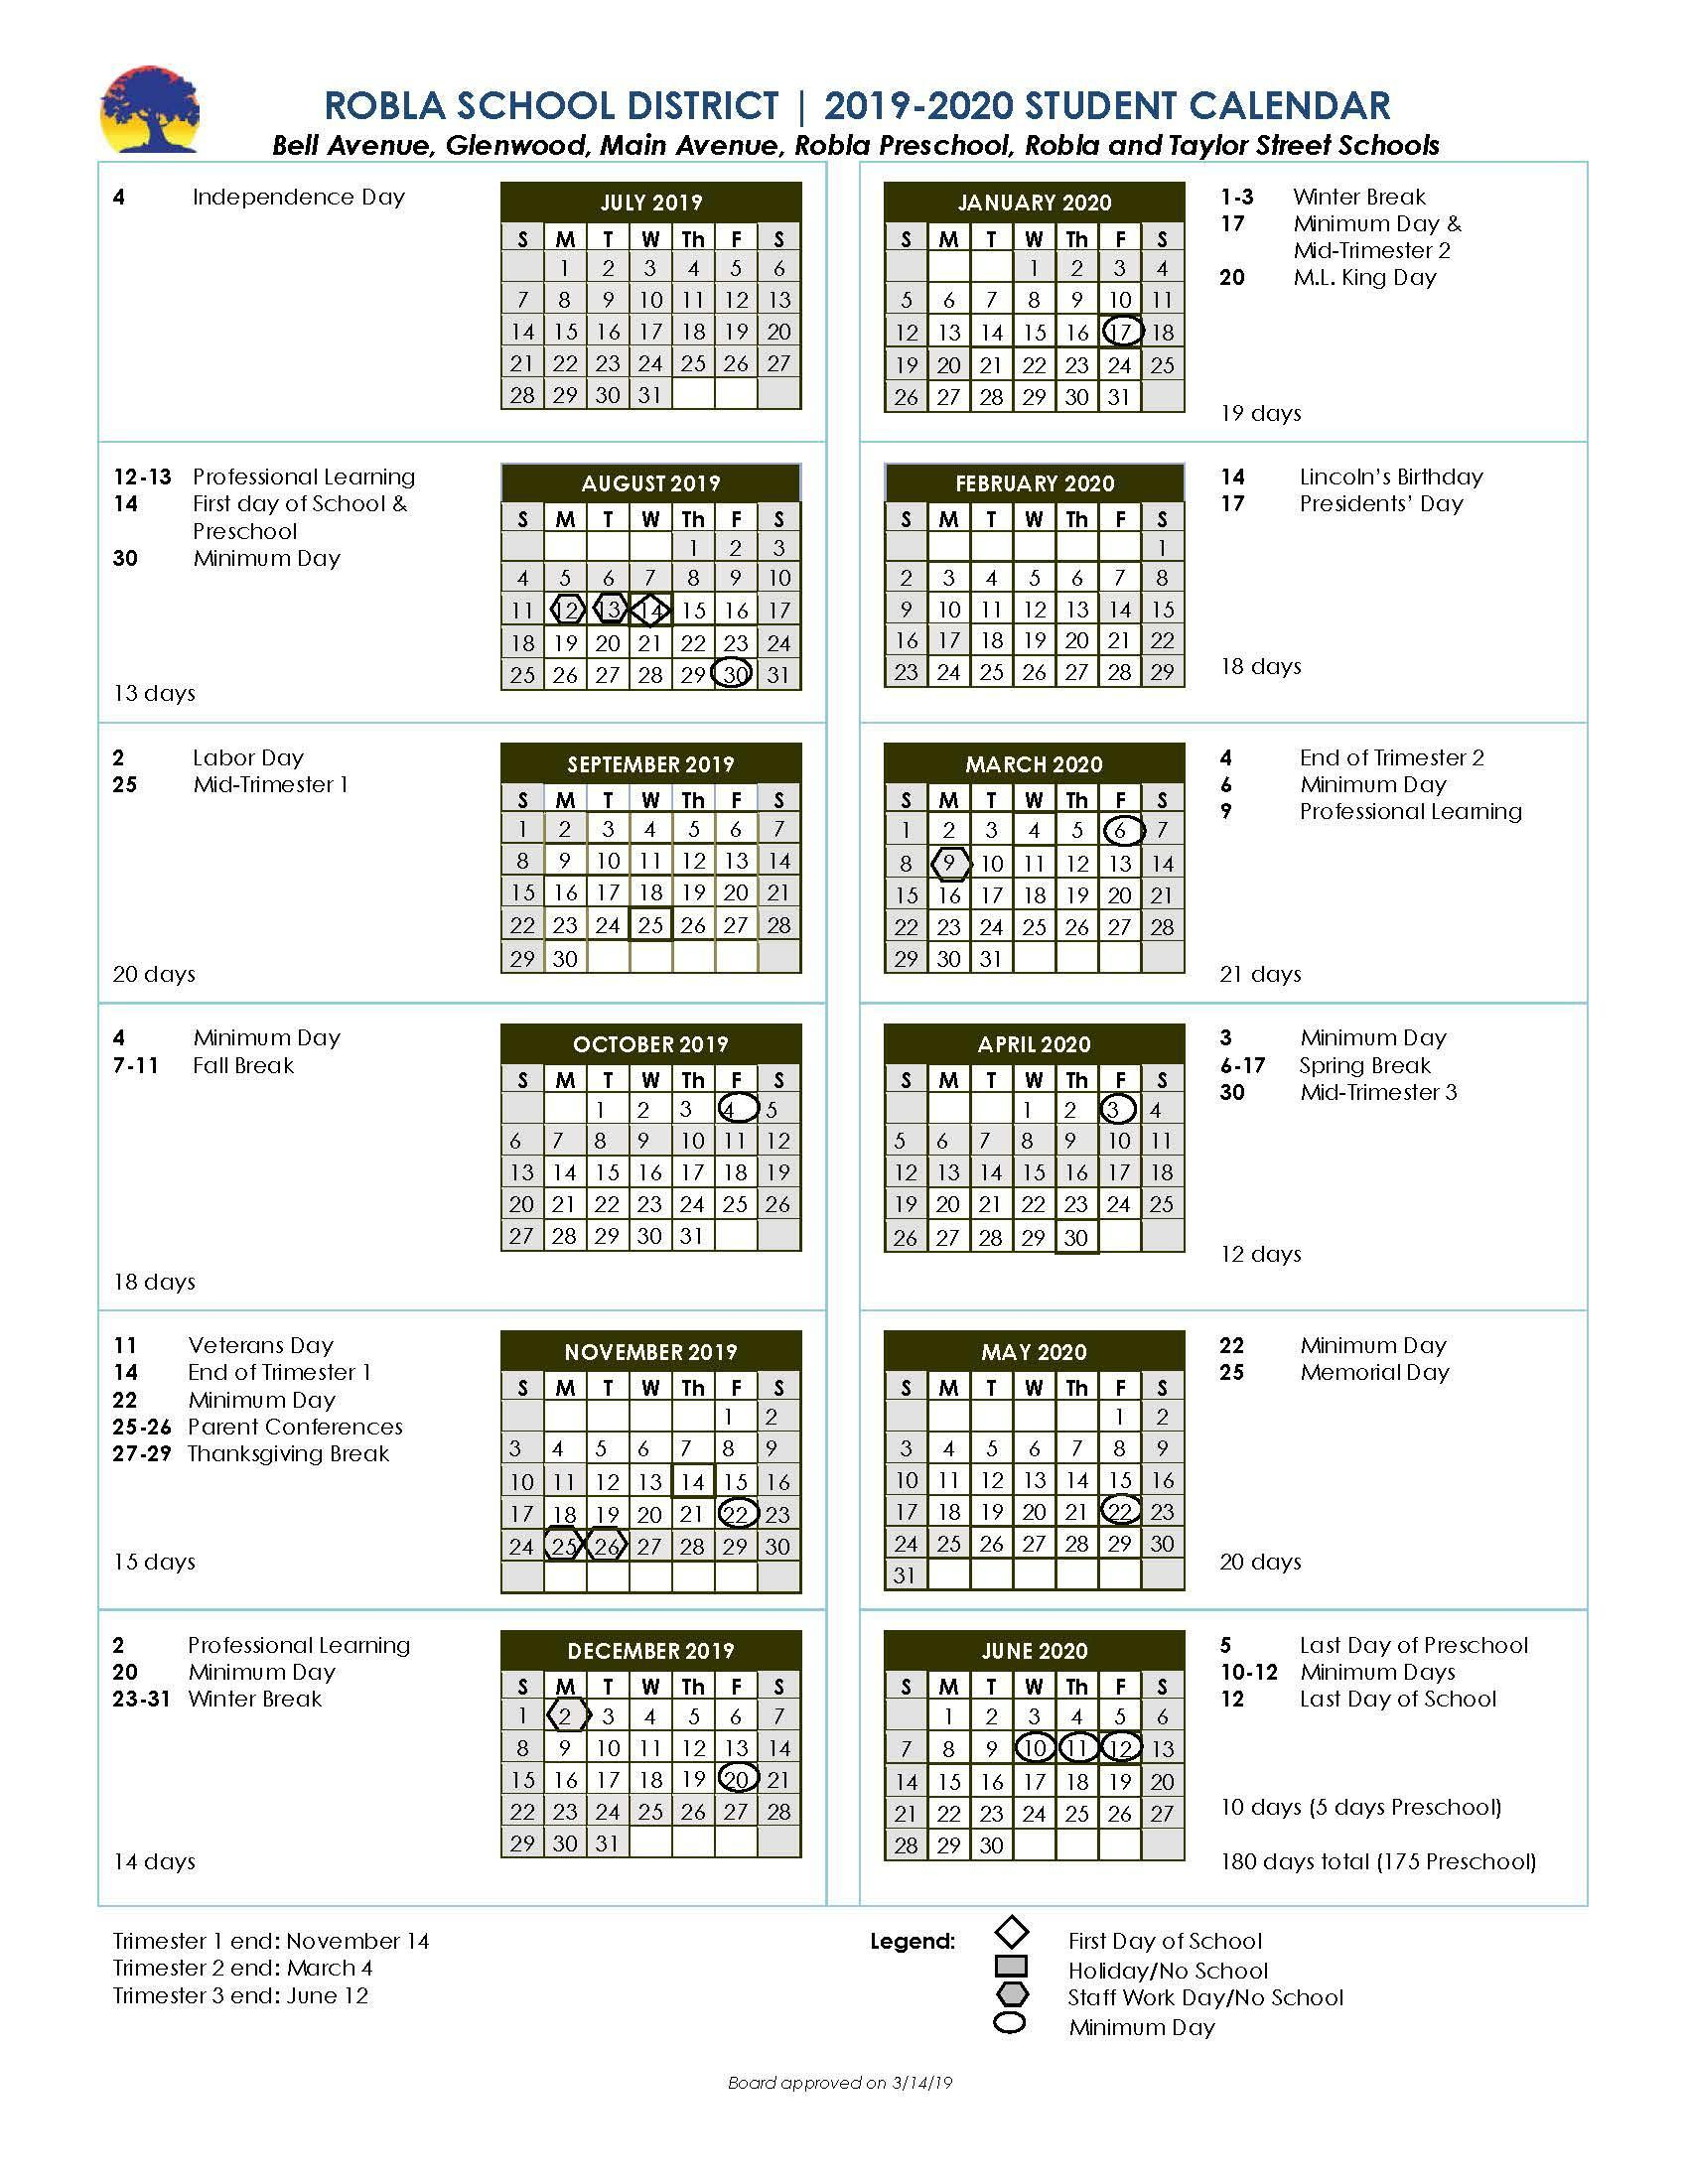 School Calendars – Student Enrollment – Robla School District For Lodi Unified School District Calendar